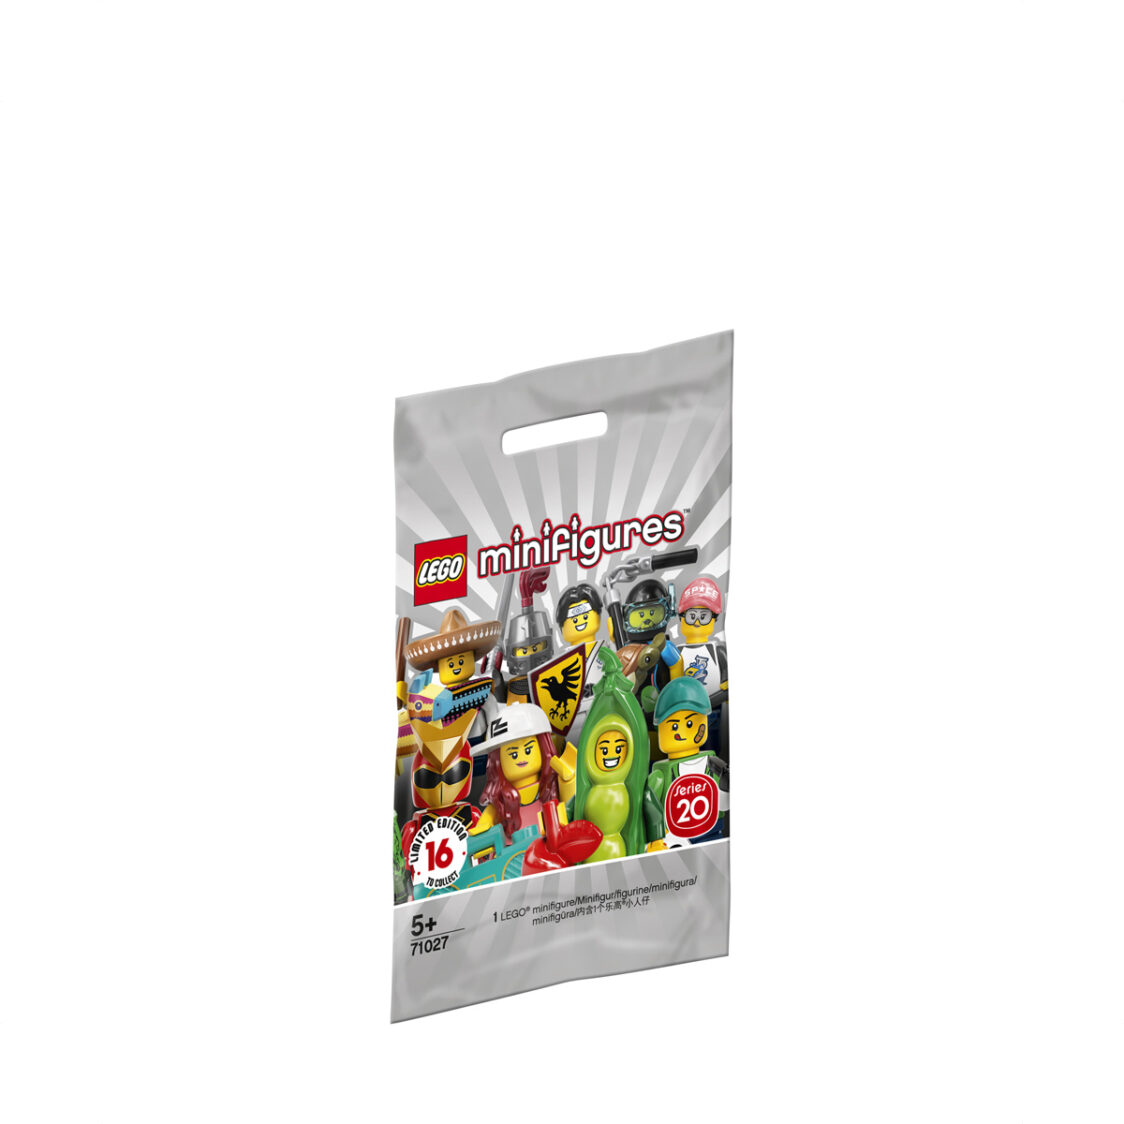 LEGO Minifigures - Series 20 71027 V29